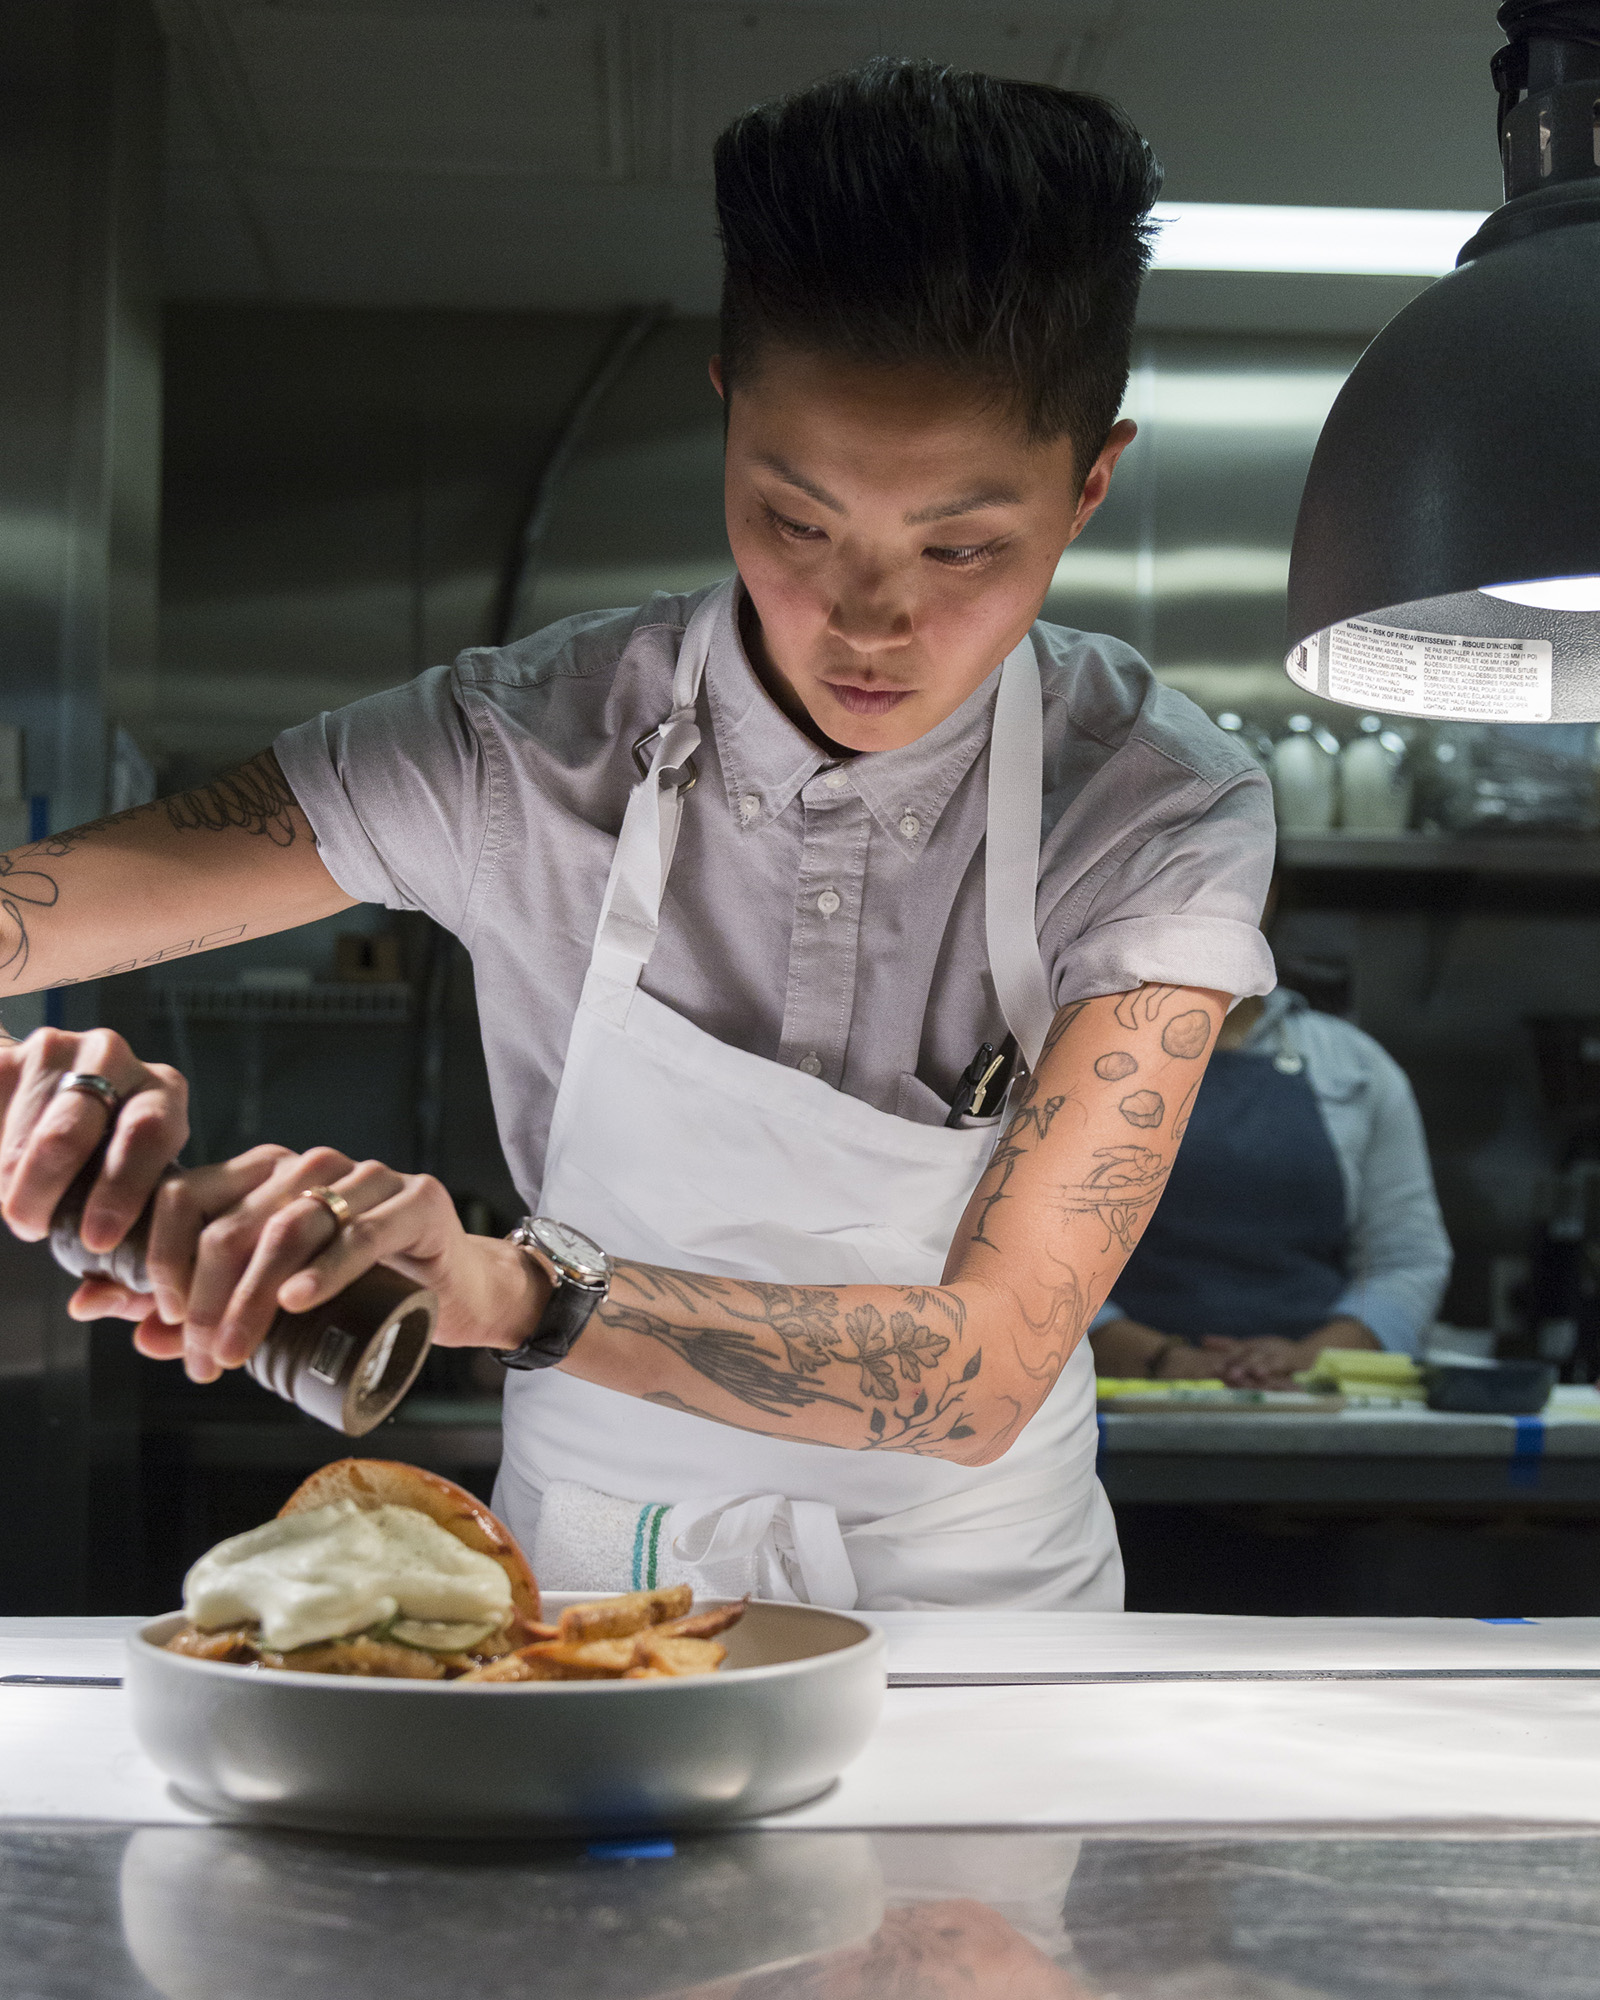 phoode, editorial food photography, food photographer, top chef, kristen kish, food photography, restaurant photography, lifestyle food photography